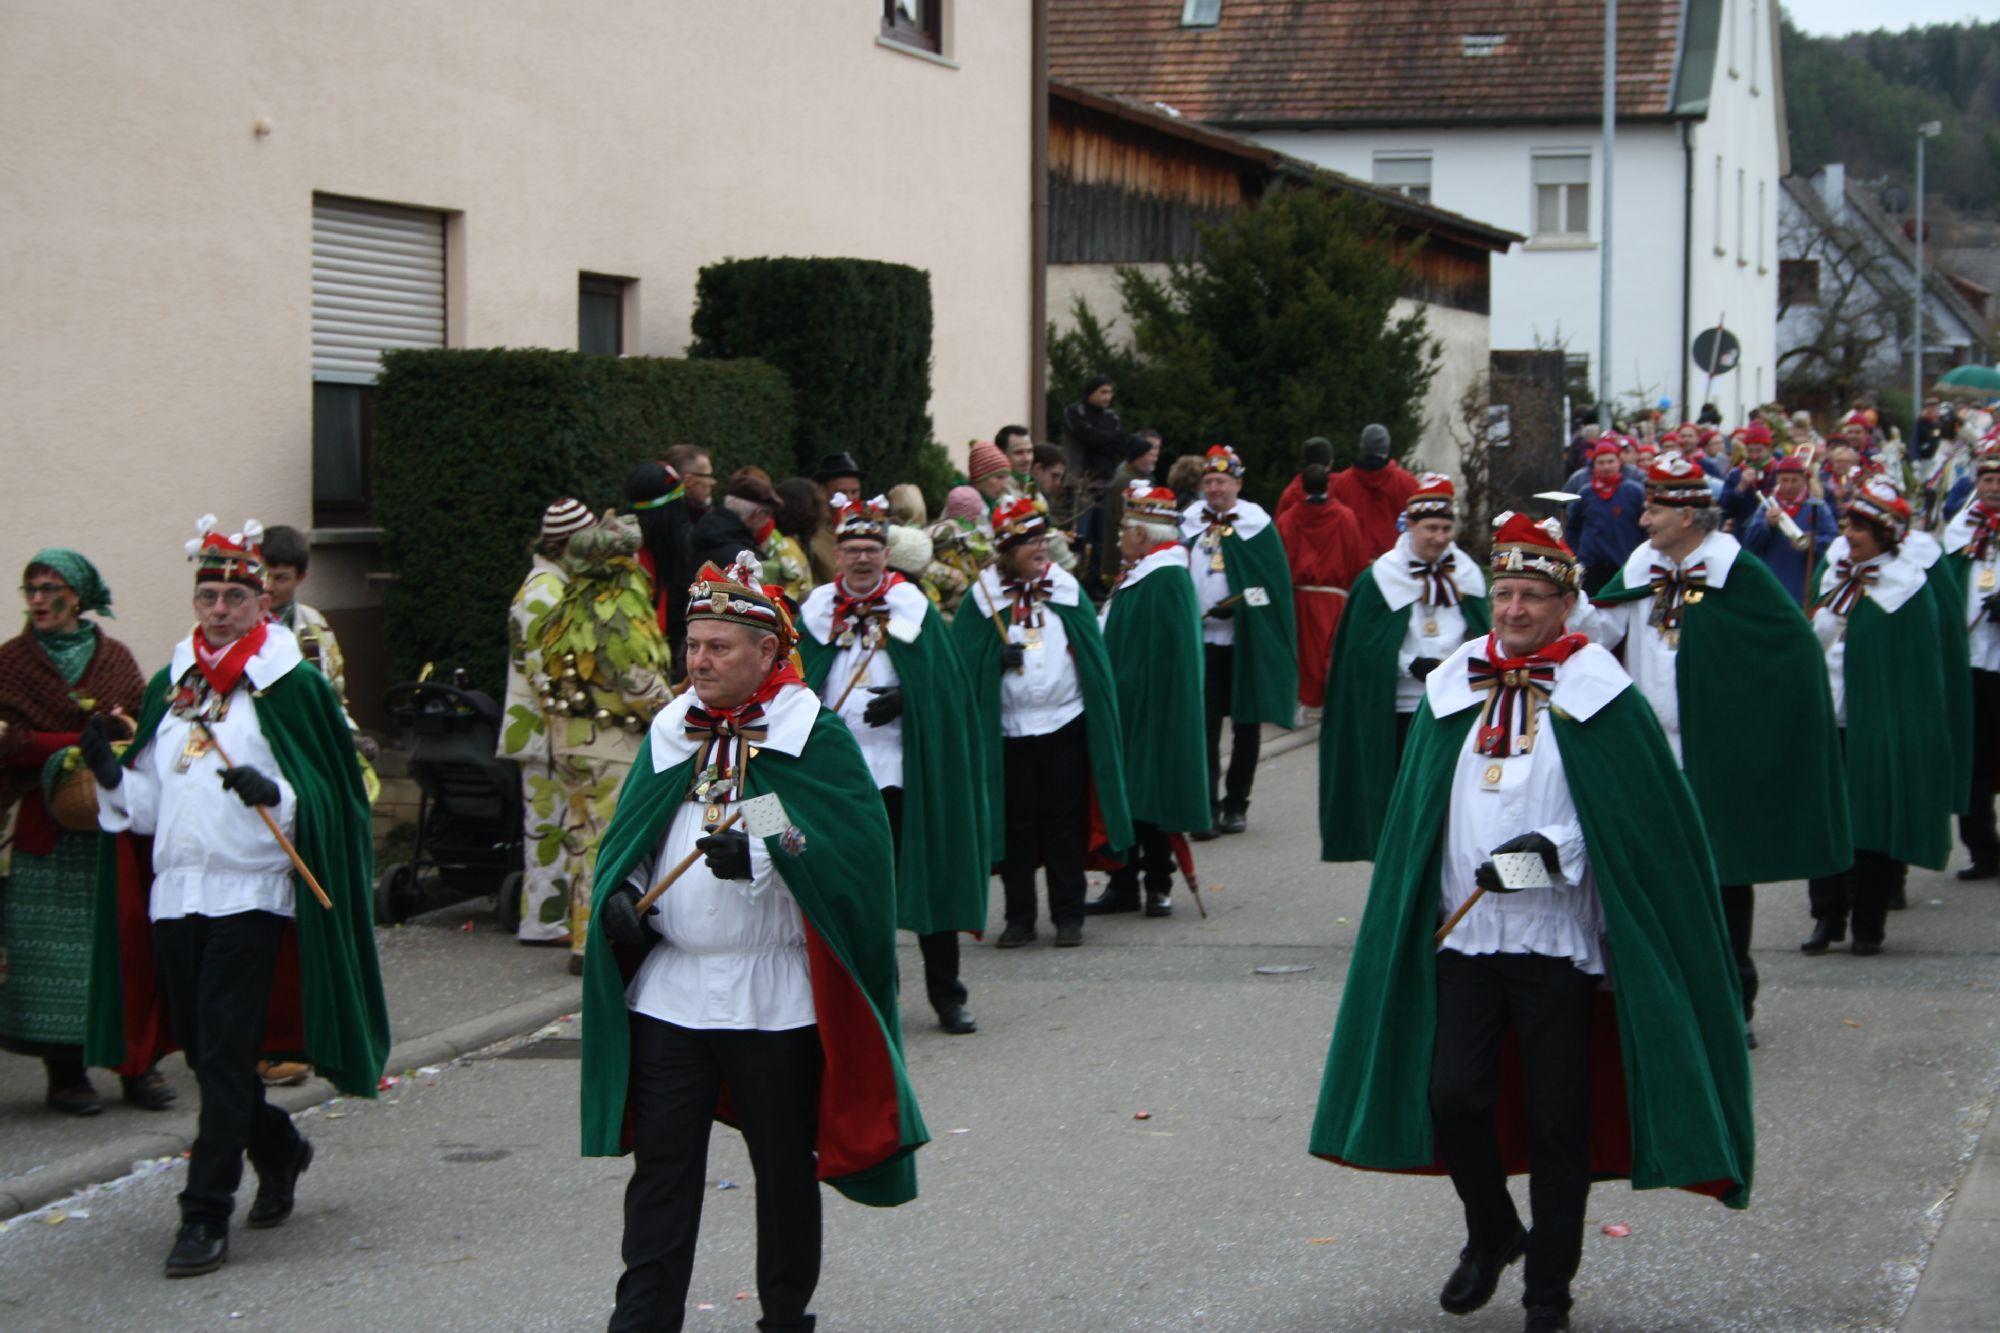 Narrenzunft Bad Dürrheim